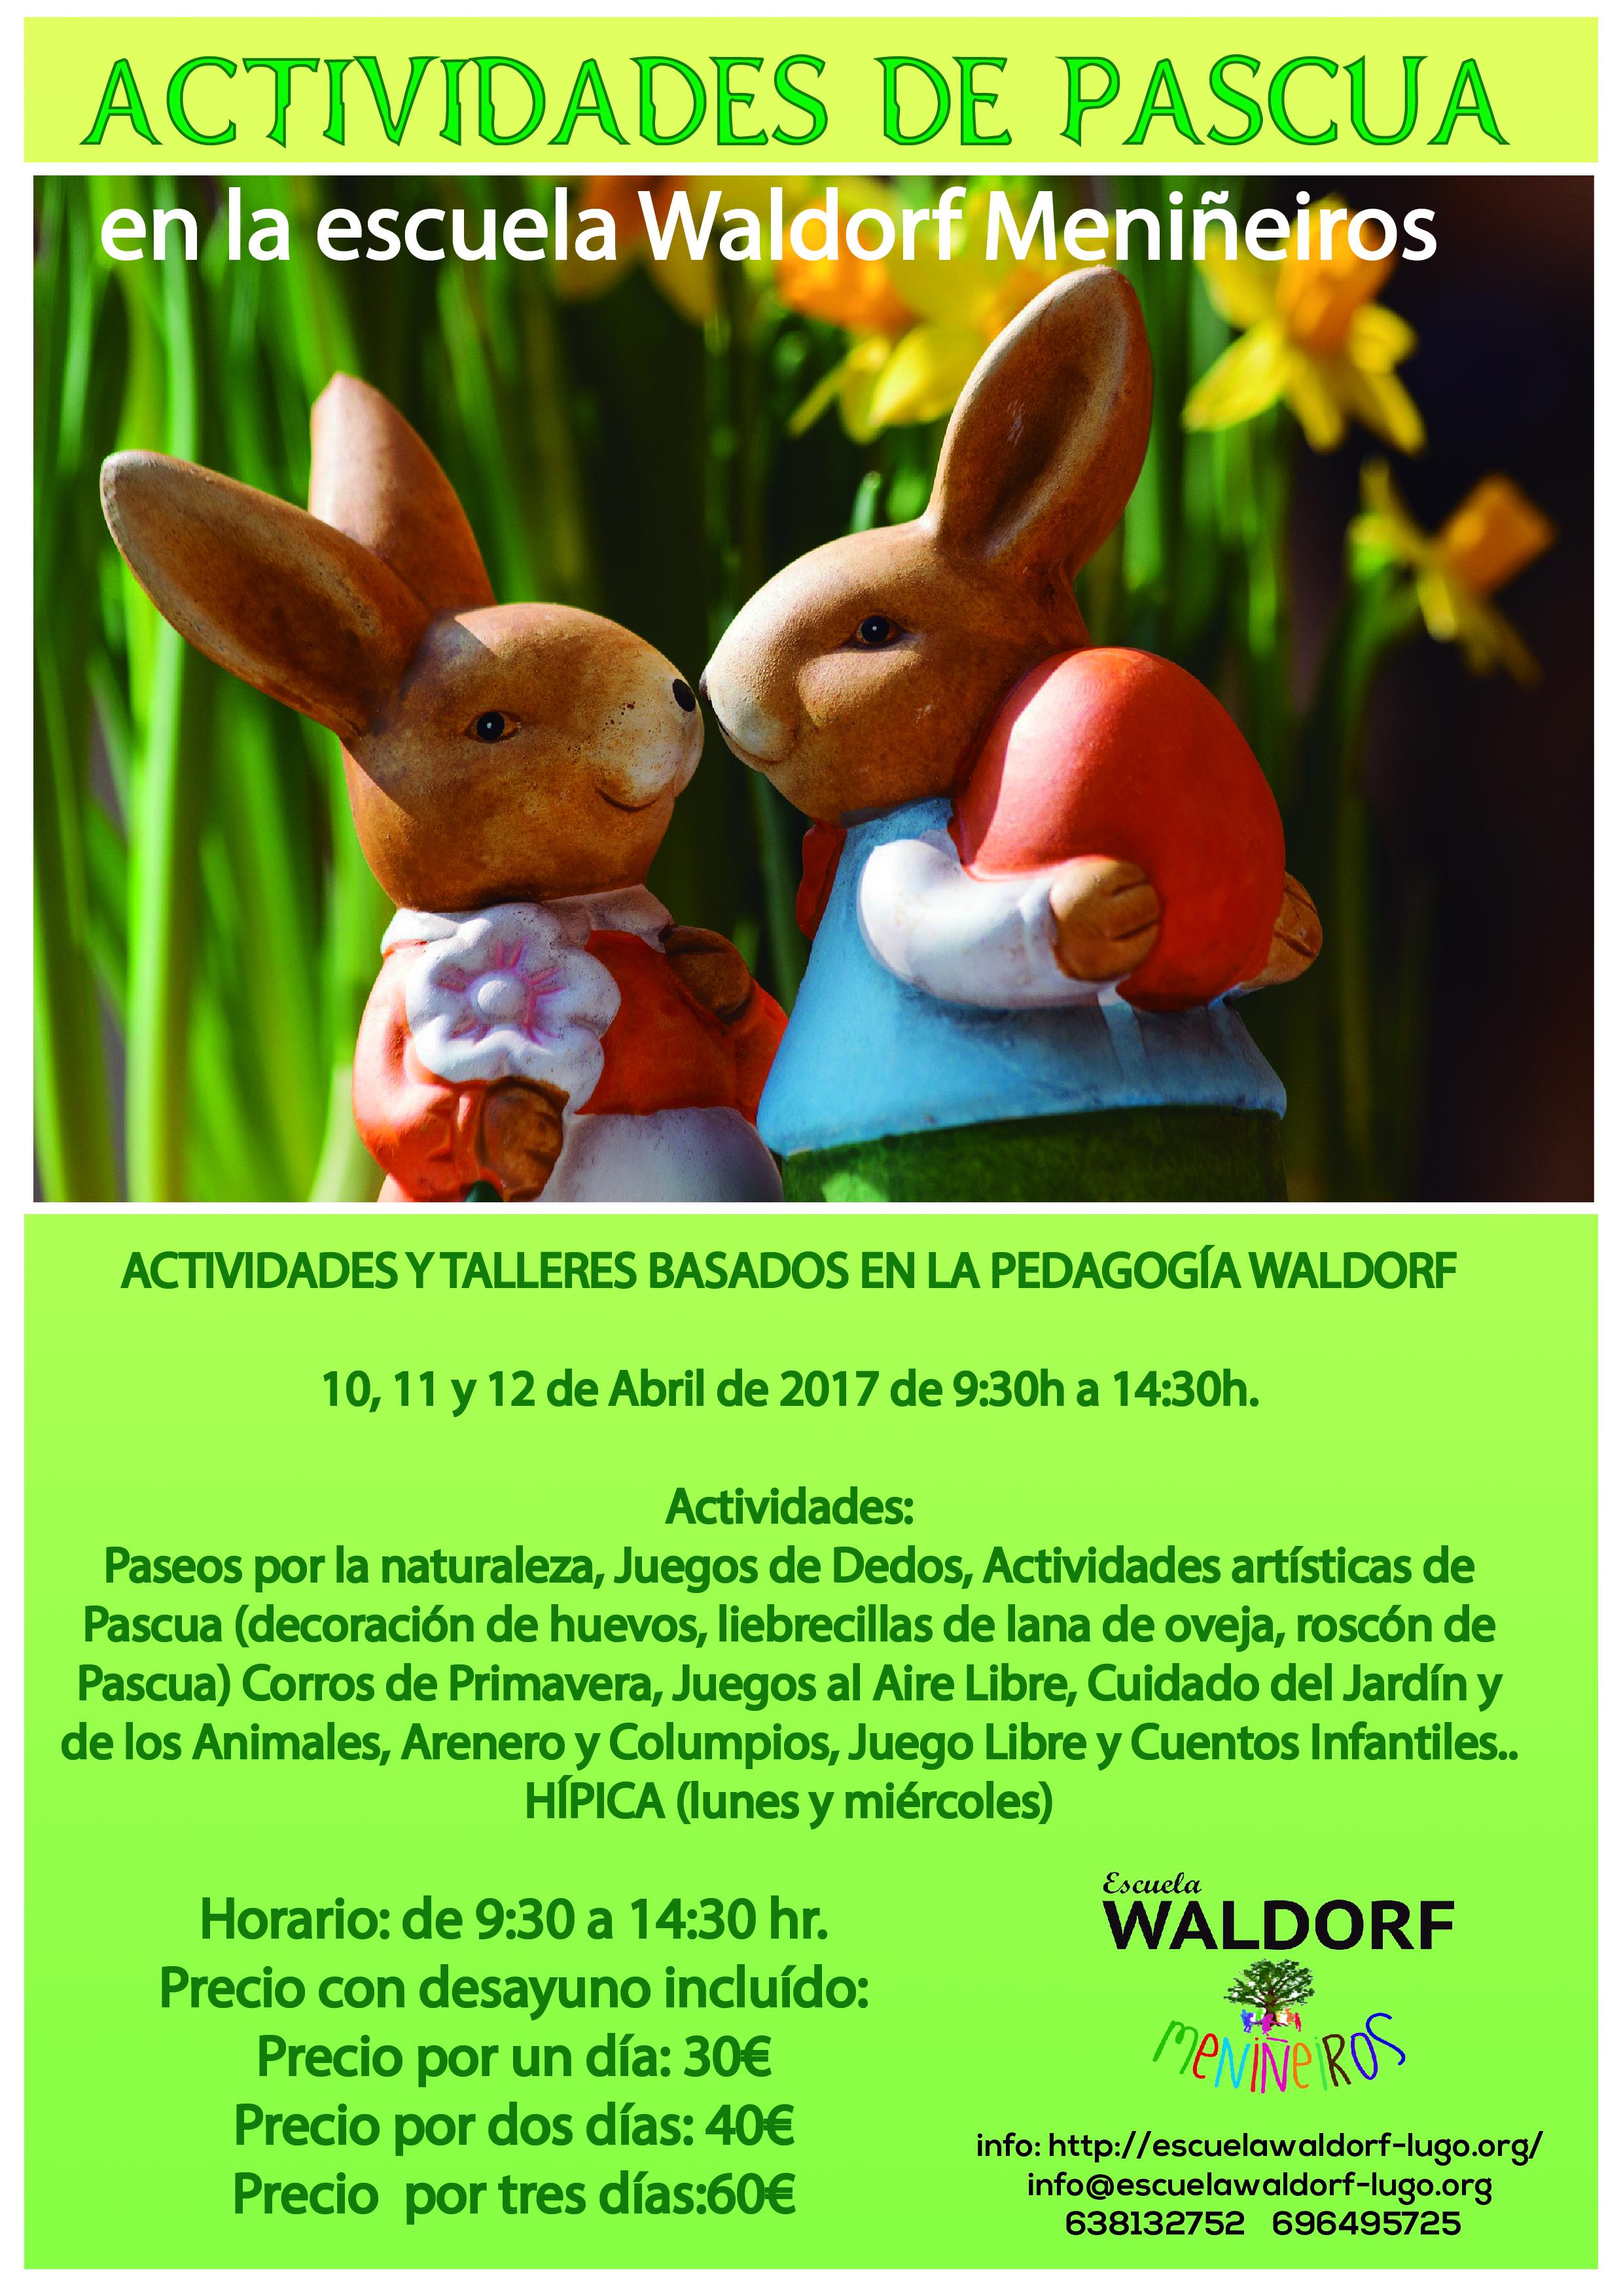 Actividades De Pascua En La Escuela Walddorf Menineiros Escuela